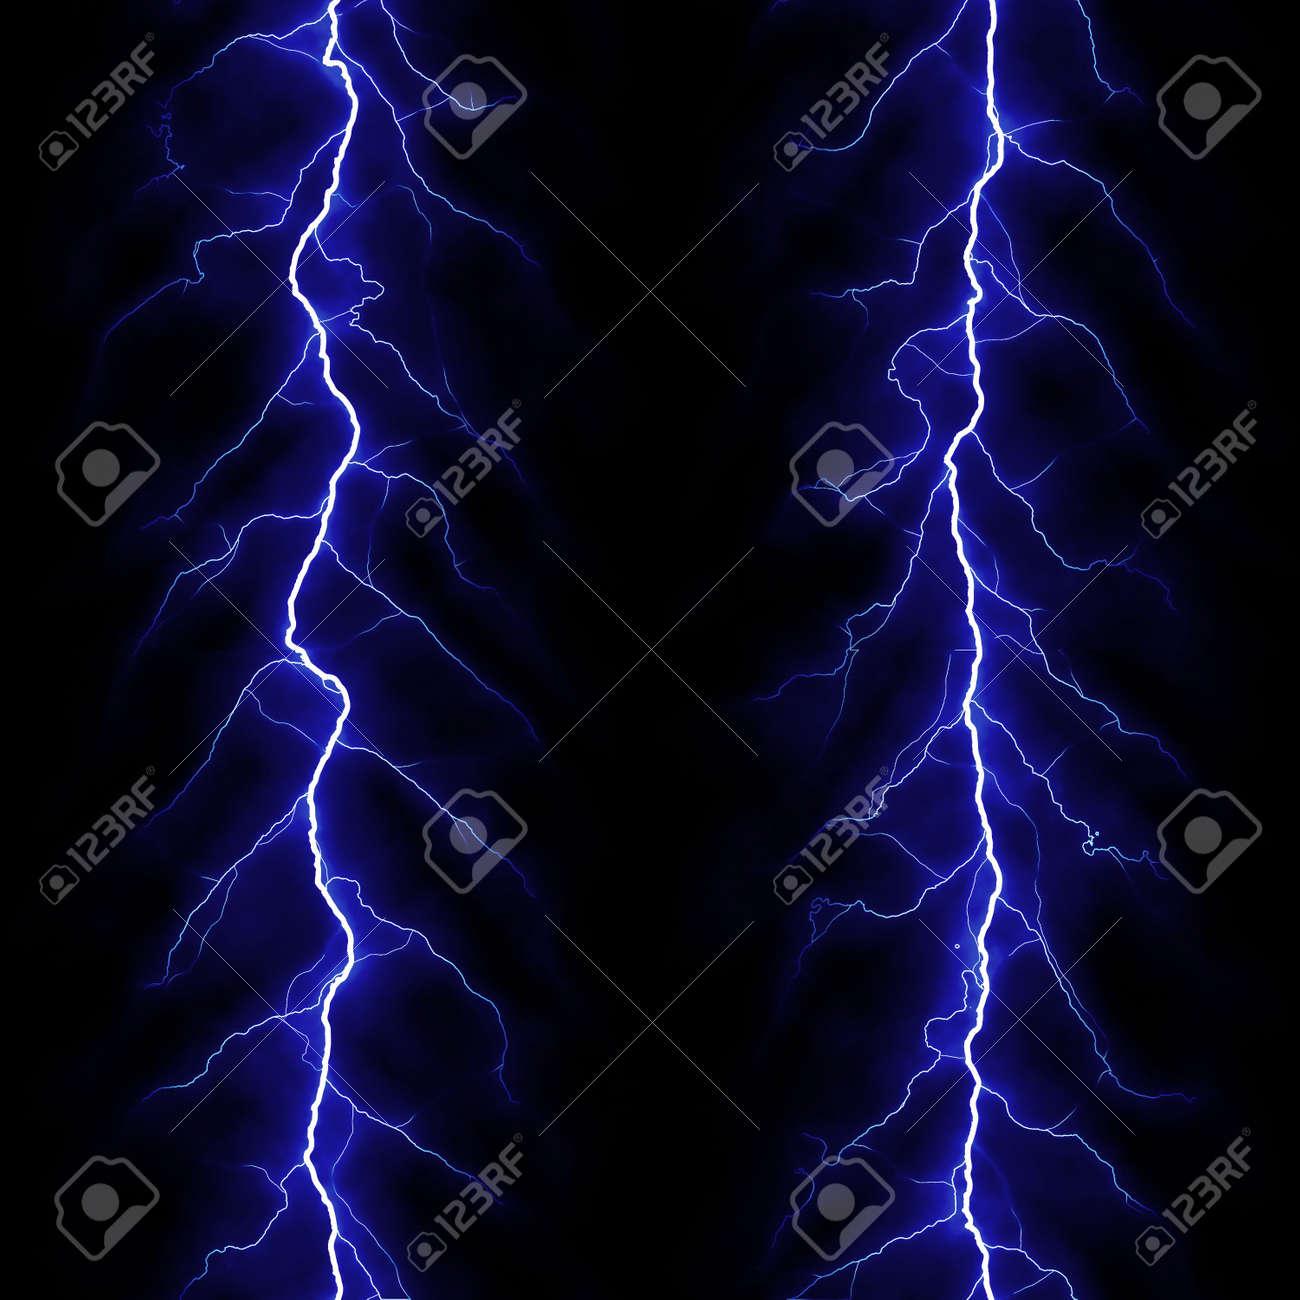 Pictures Of Lightning Bolts Come listen Zephyr Lightning Bolts